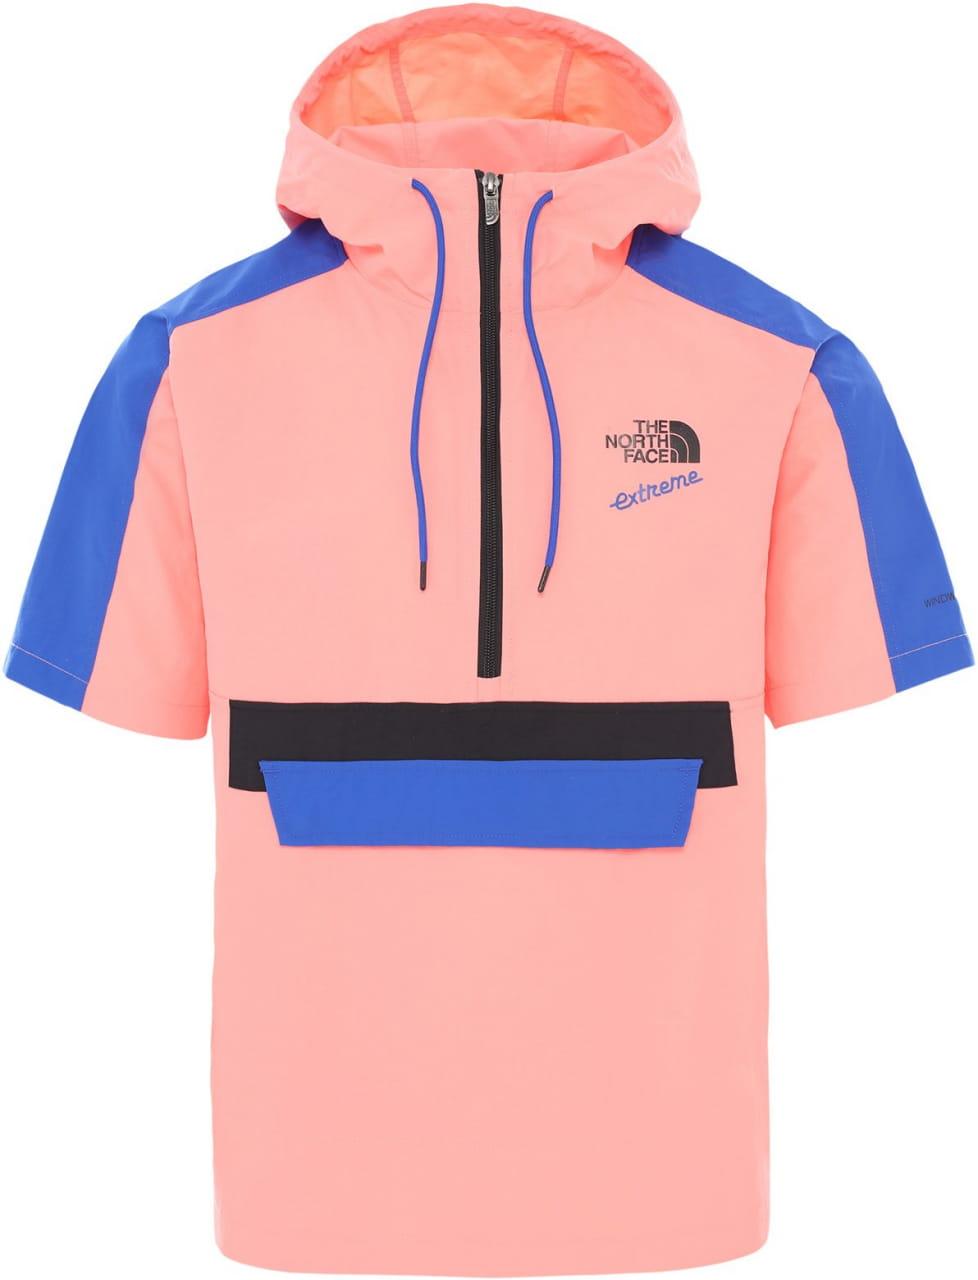 Pánská větrovka The North Face Men's Extreme Wind Shirt Hoodie